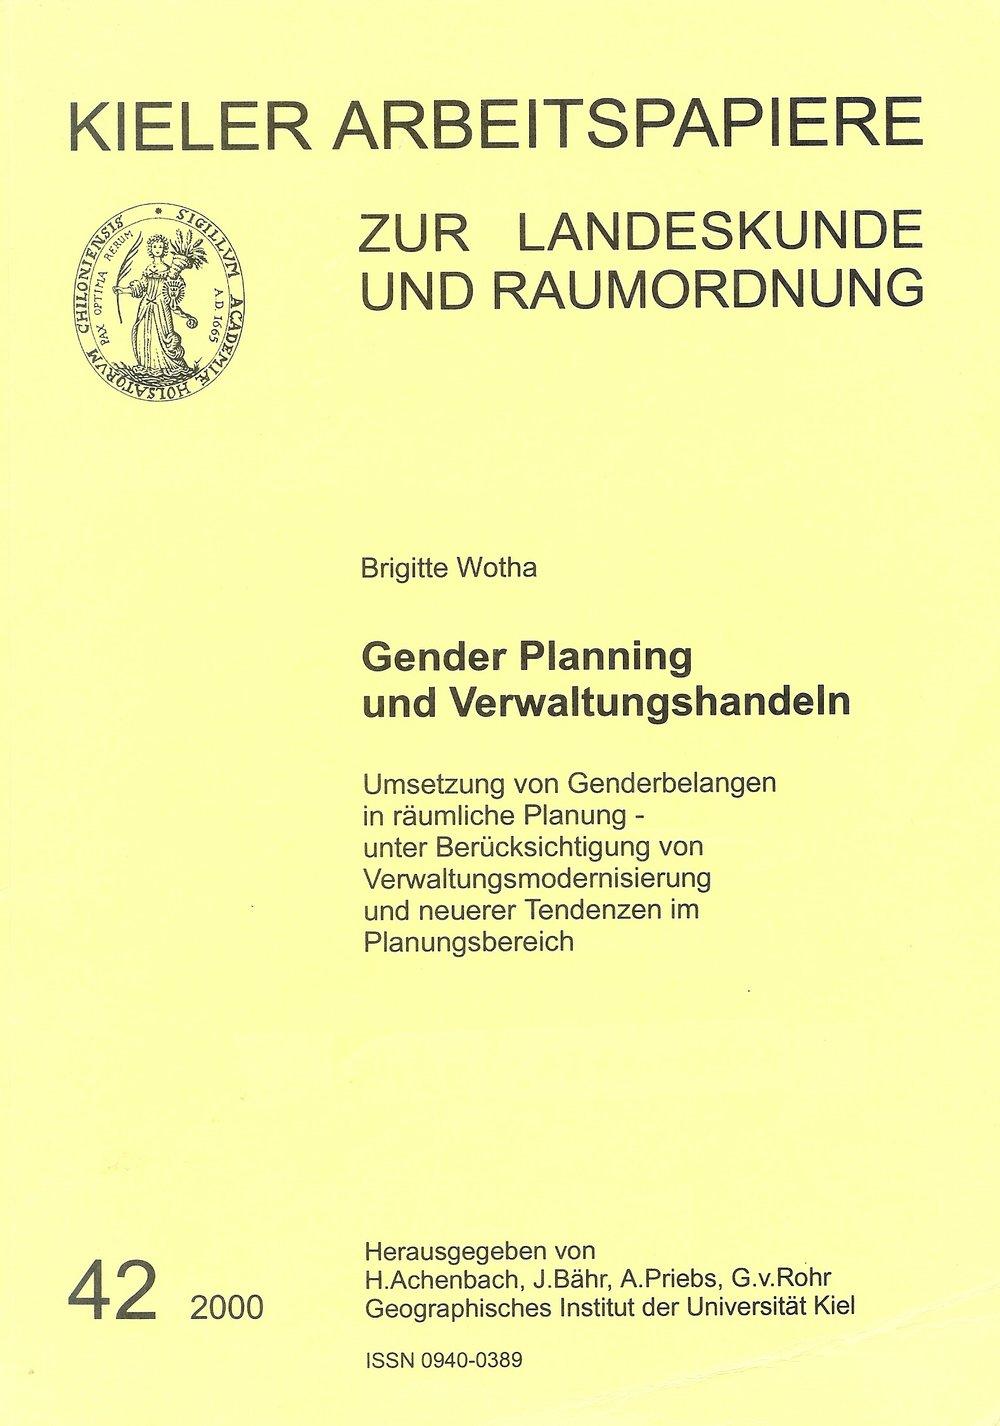 Gender mainstreaming v administrativě příručka od Brigitte Worthové